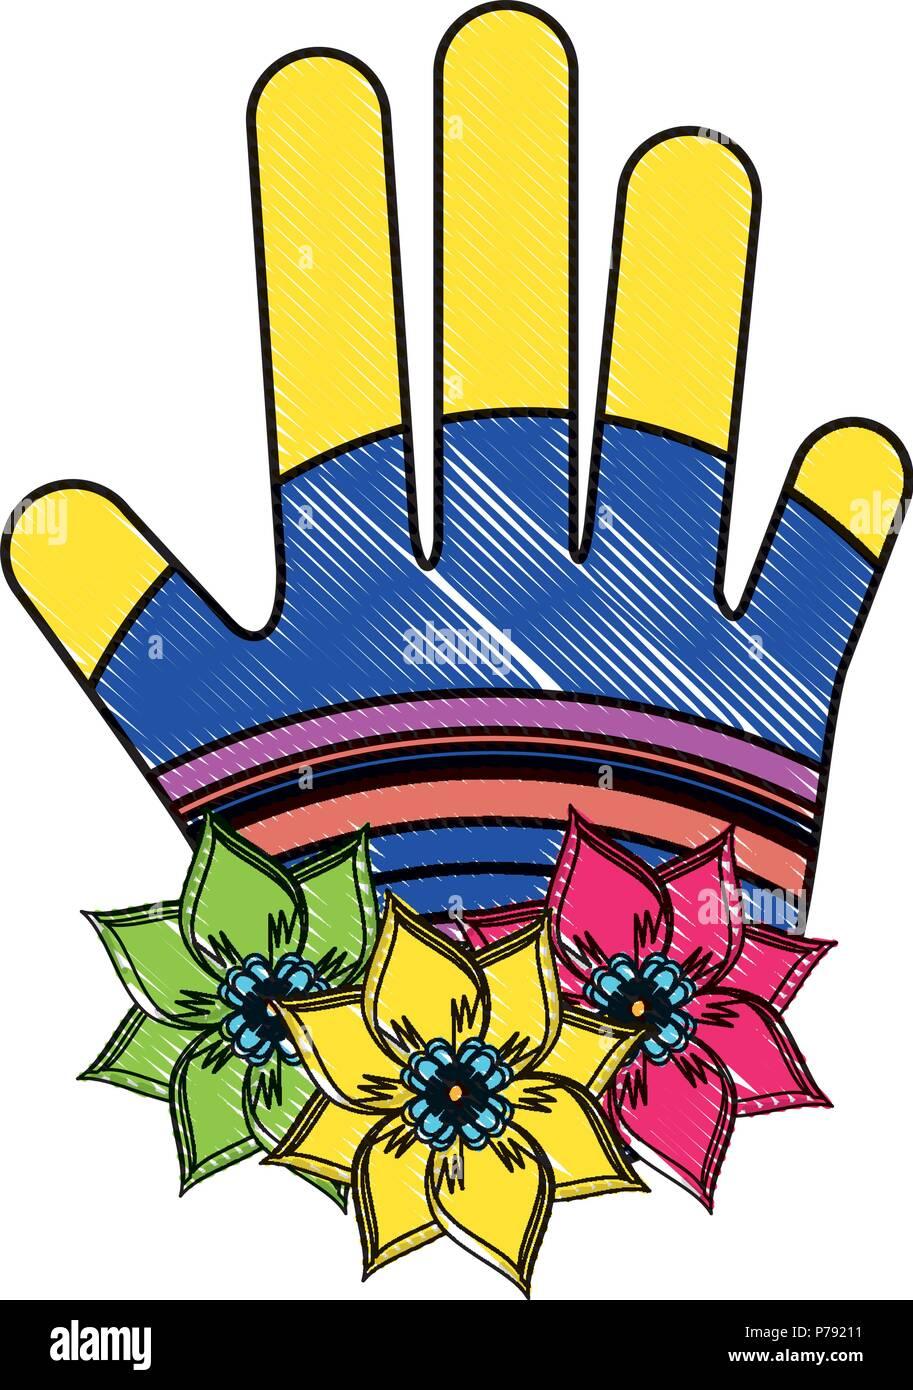 Hamsa hand with beautiful flowers design over white background hamsa hand with beautiful flowers design over white background vector illustration izmirmasajfo